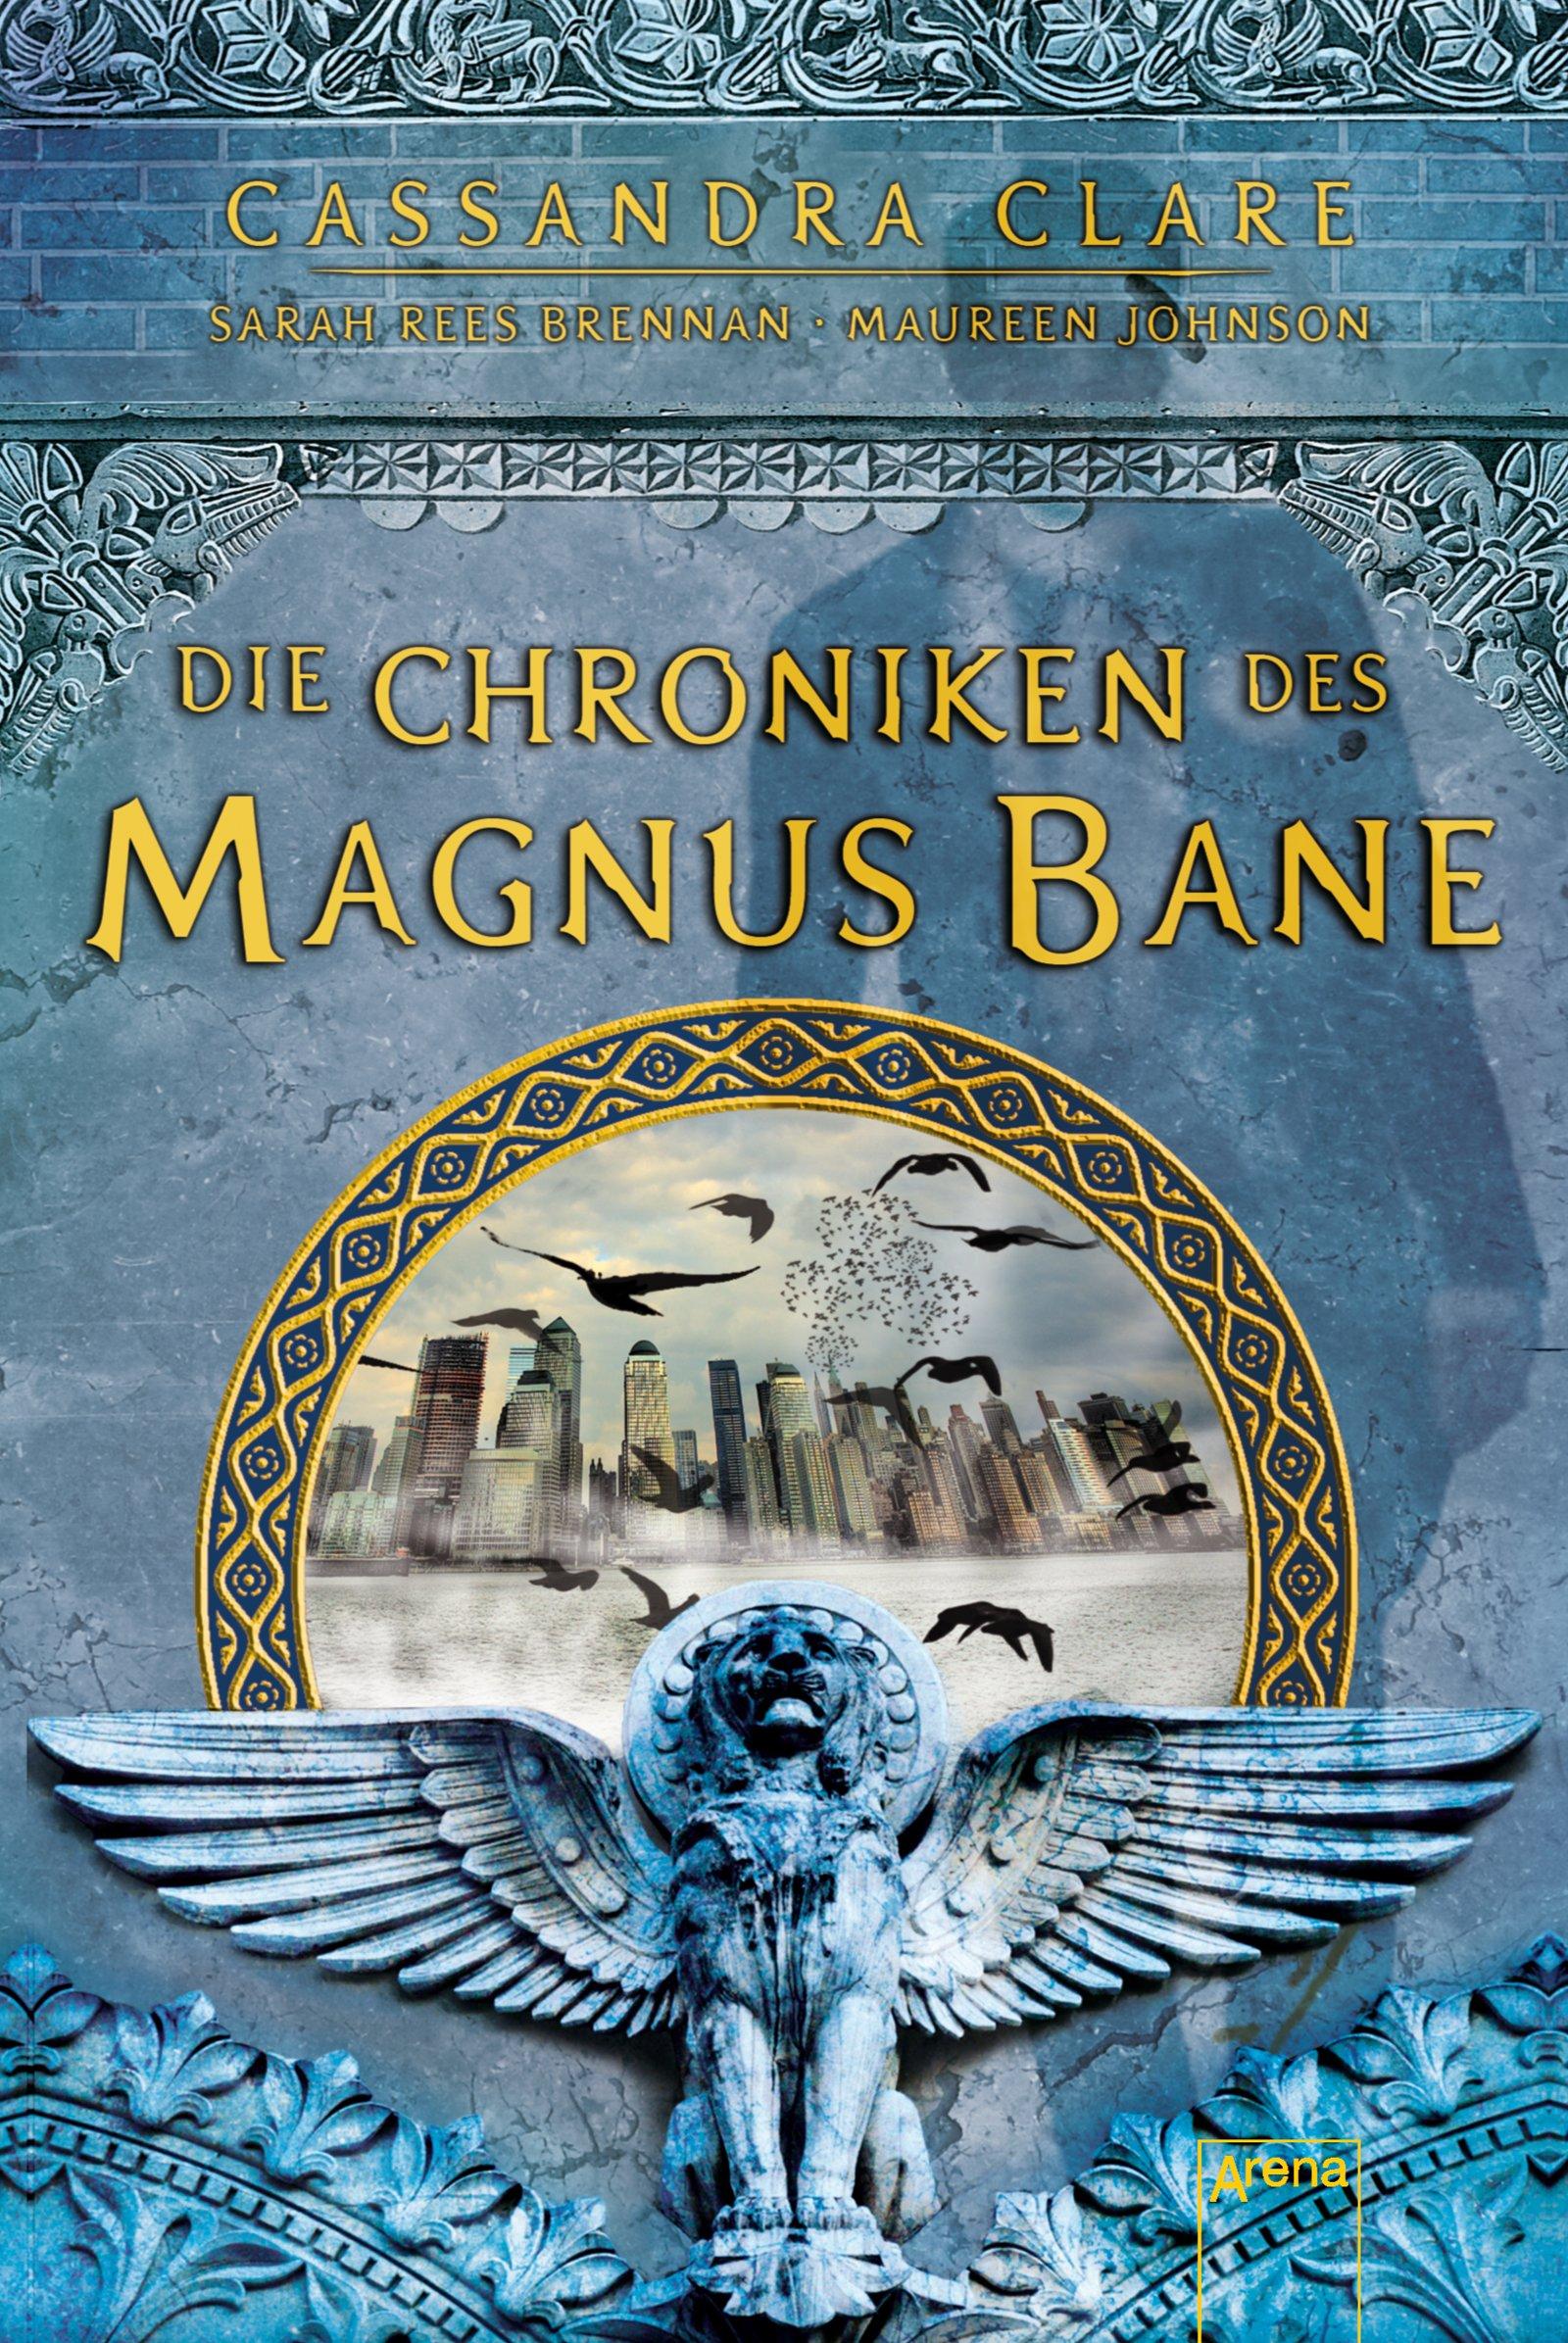 http://www.amazon.de/Chroniken-Magnus-Bane-Cassandra-Clare/dp/3401069756/ref=sr_1_1?ie=UTF8&qid=1433331877&sr=8-1&keywords=die+chroniken+des+magnus+bane